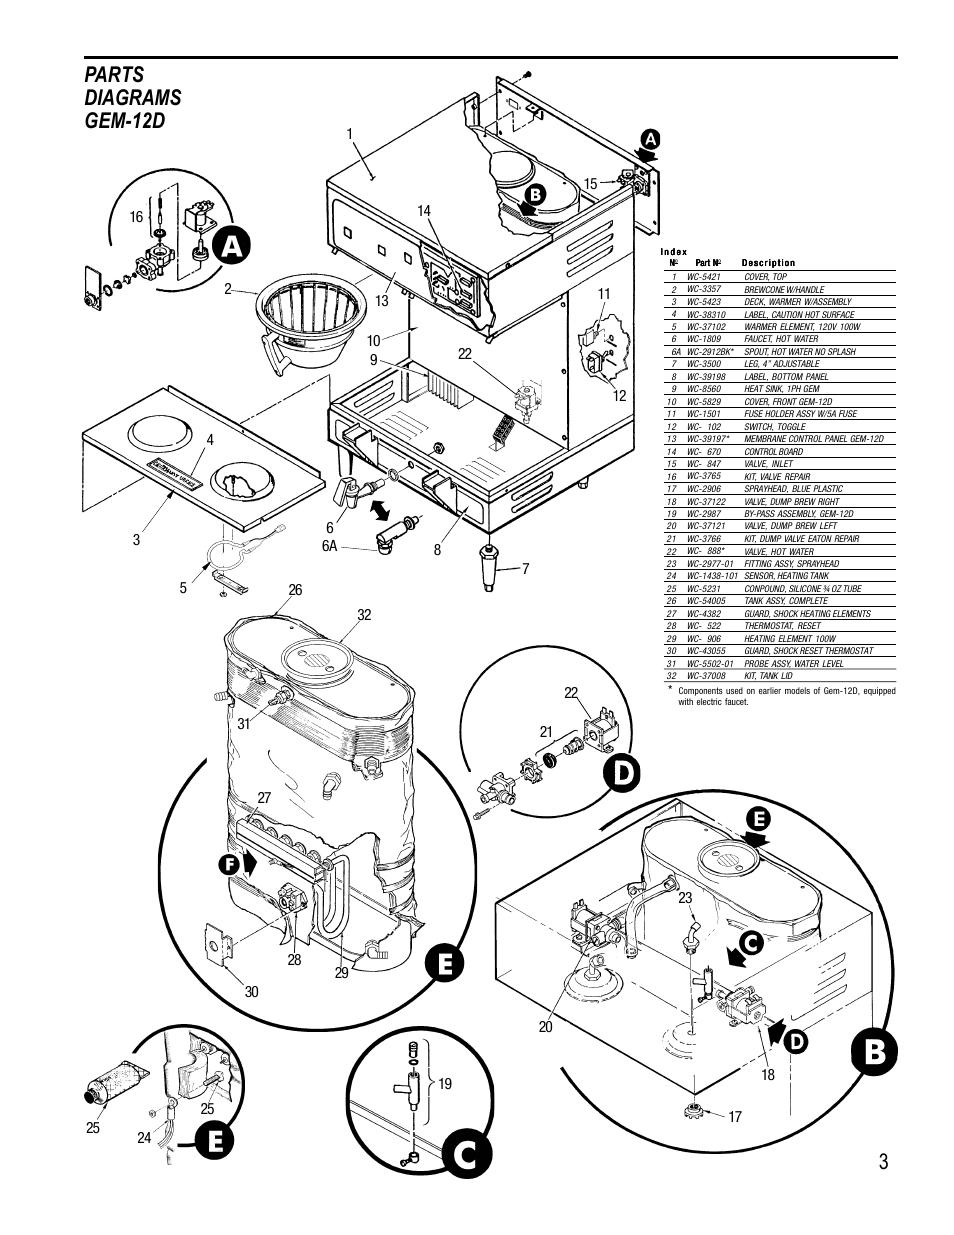 3parts Diagrams Gem  4